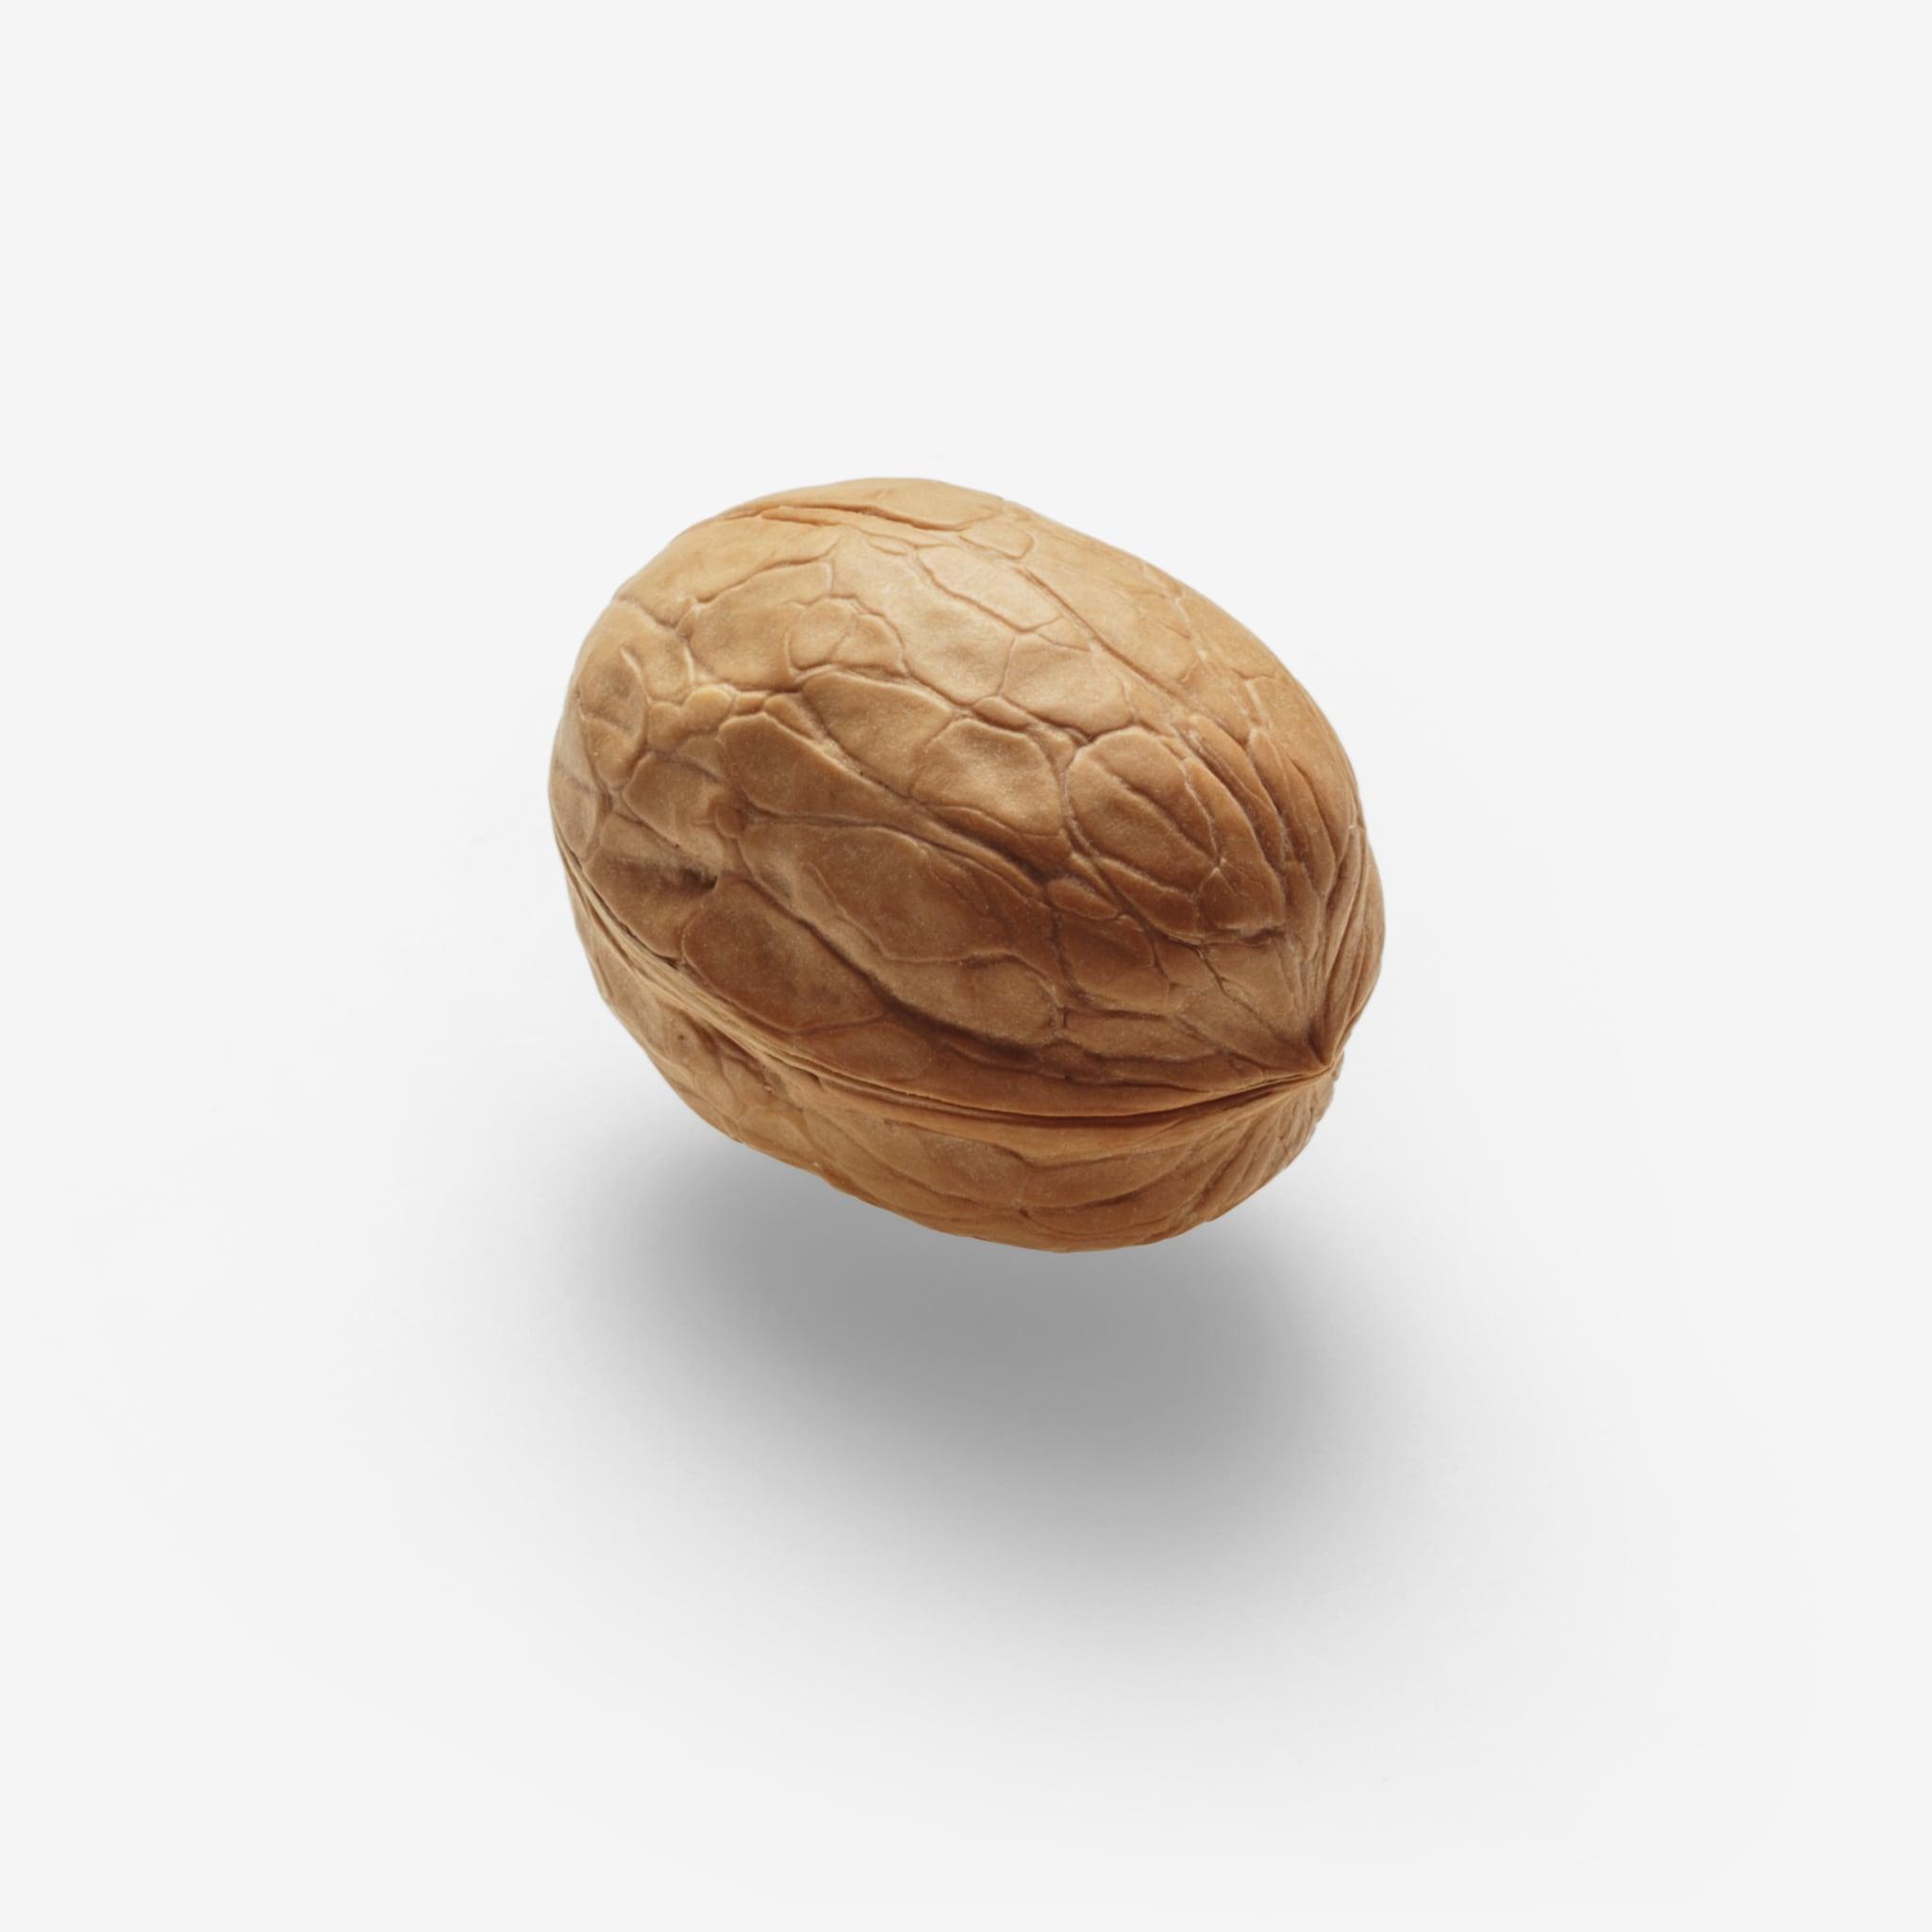 Walnut image with transparent background